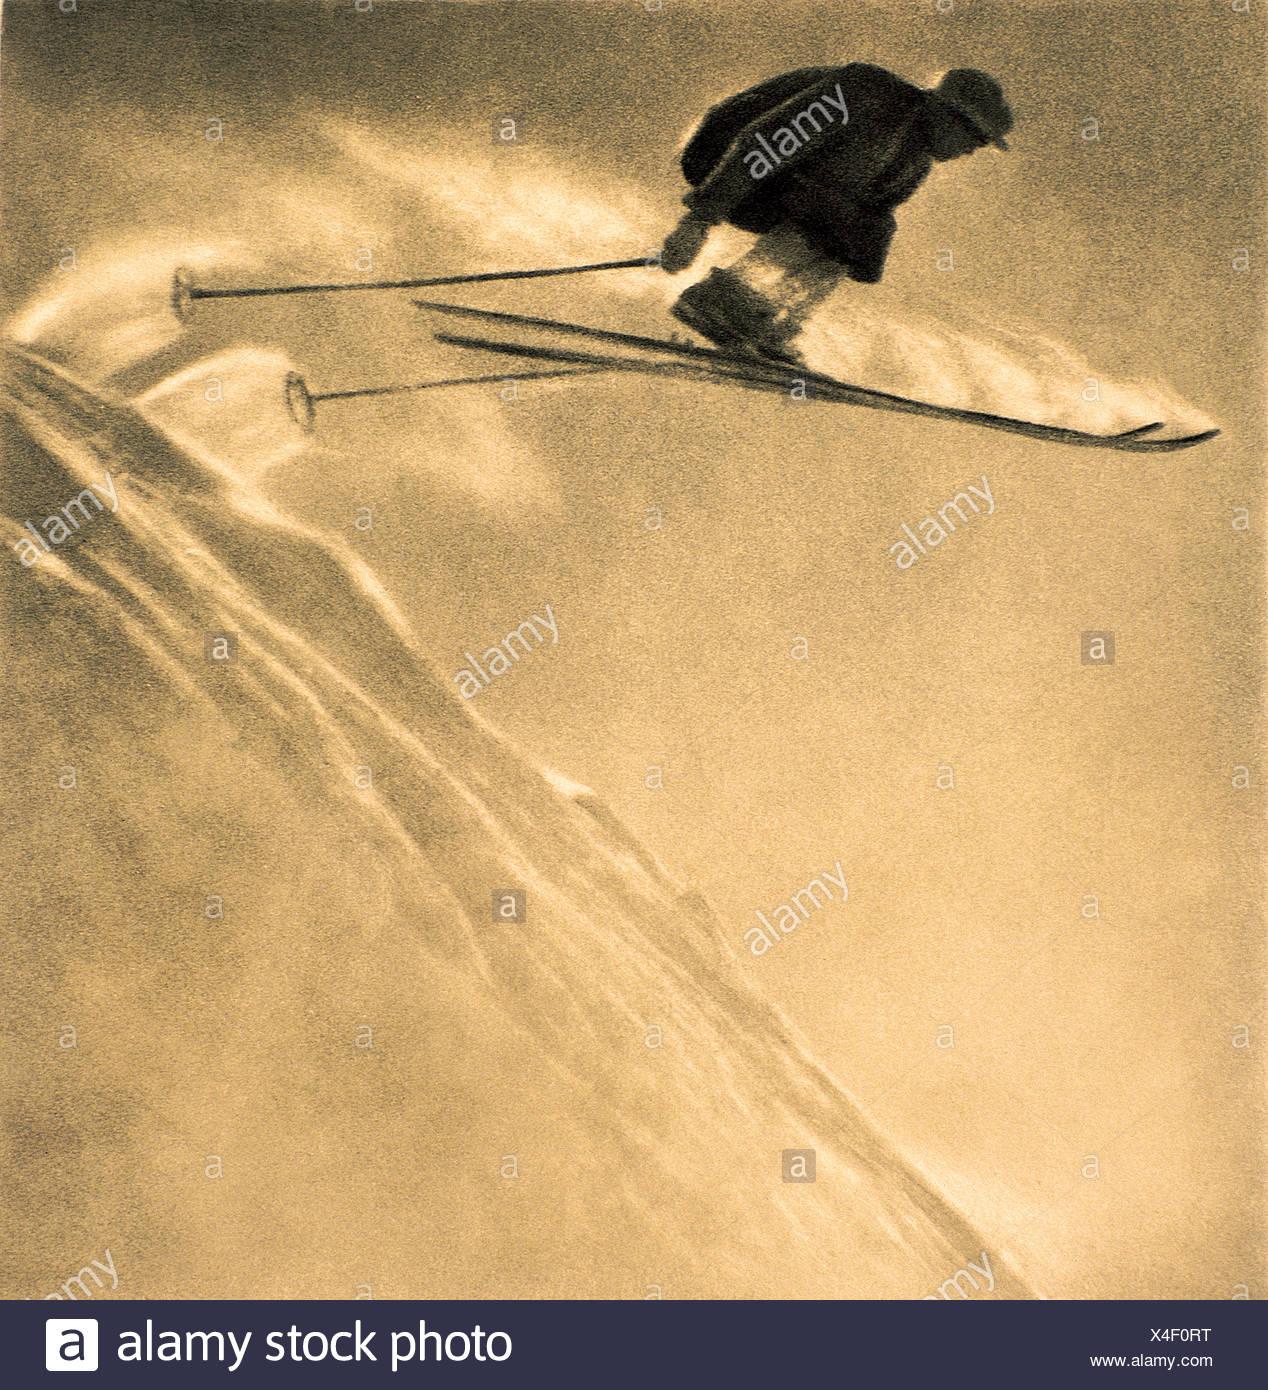 Skier in mid air action stunt in St Anton an Arlberg, Landeck, Tyrol, Austria - Stock Image